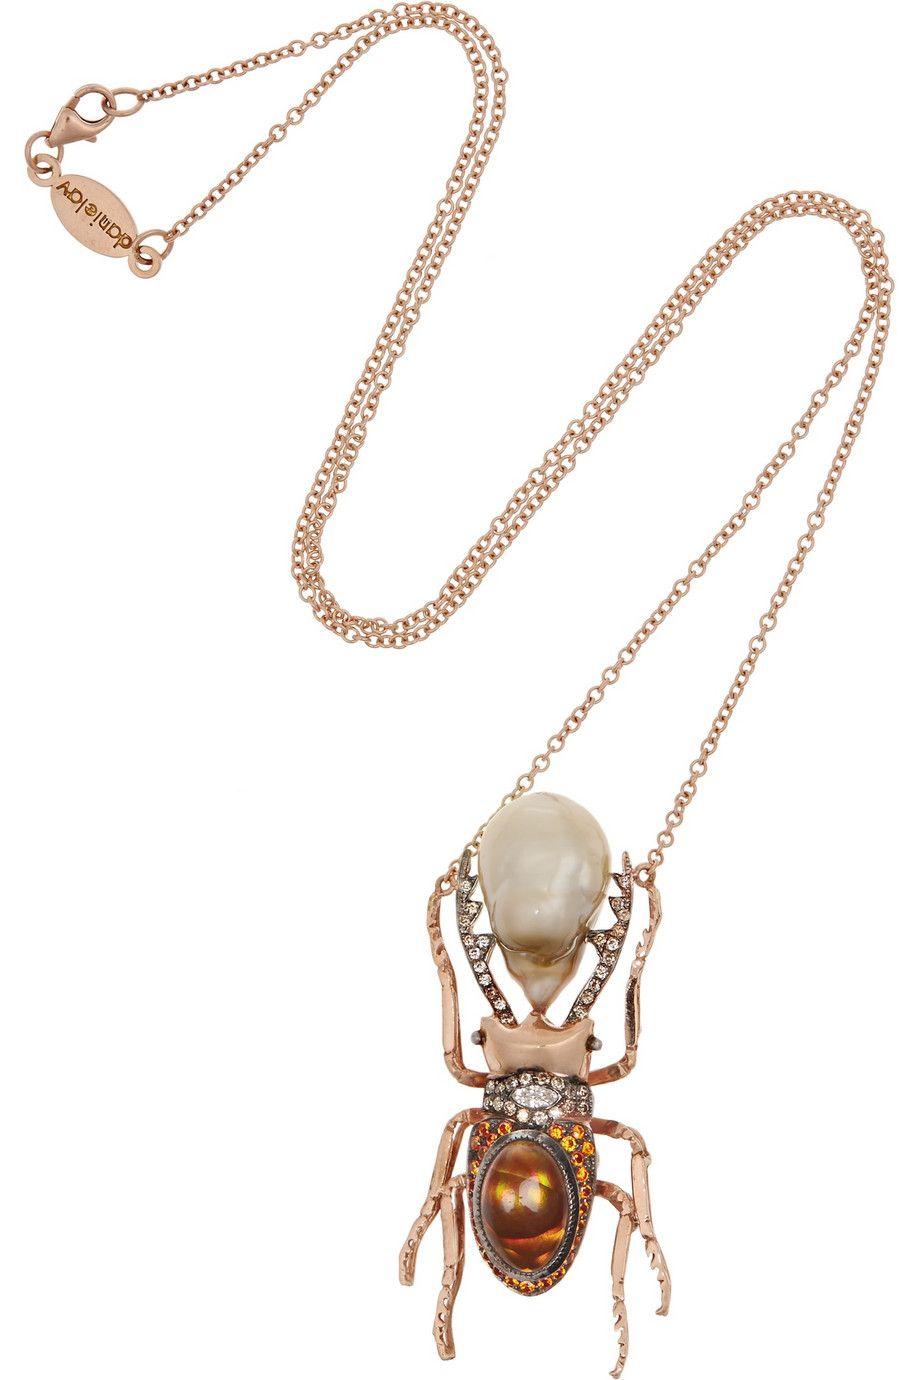 Daniela Villegas Jewelry necklace gold rose gold Multi stone